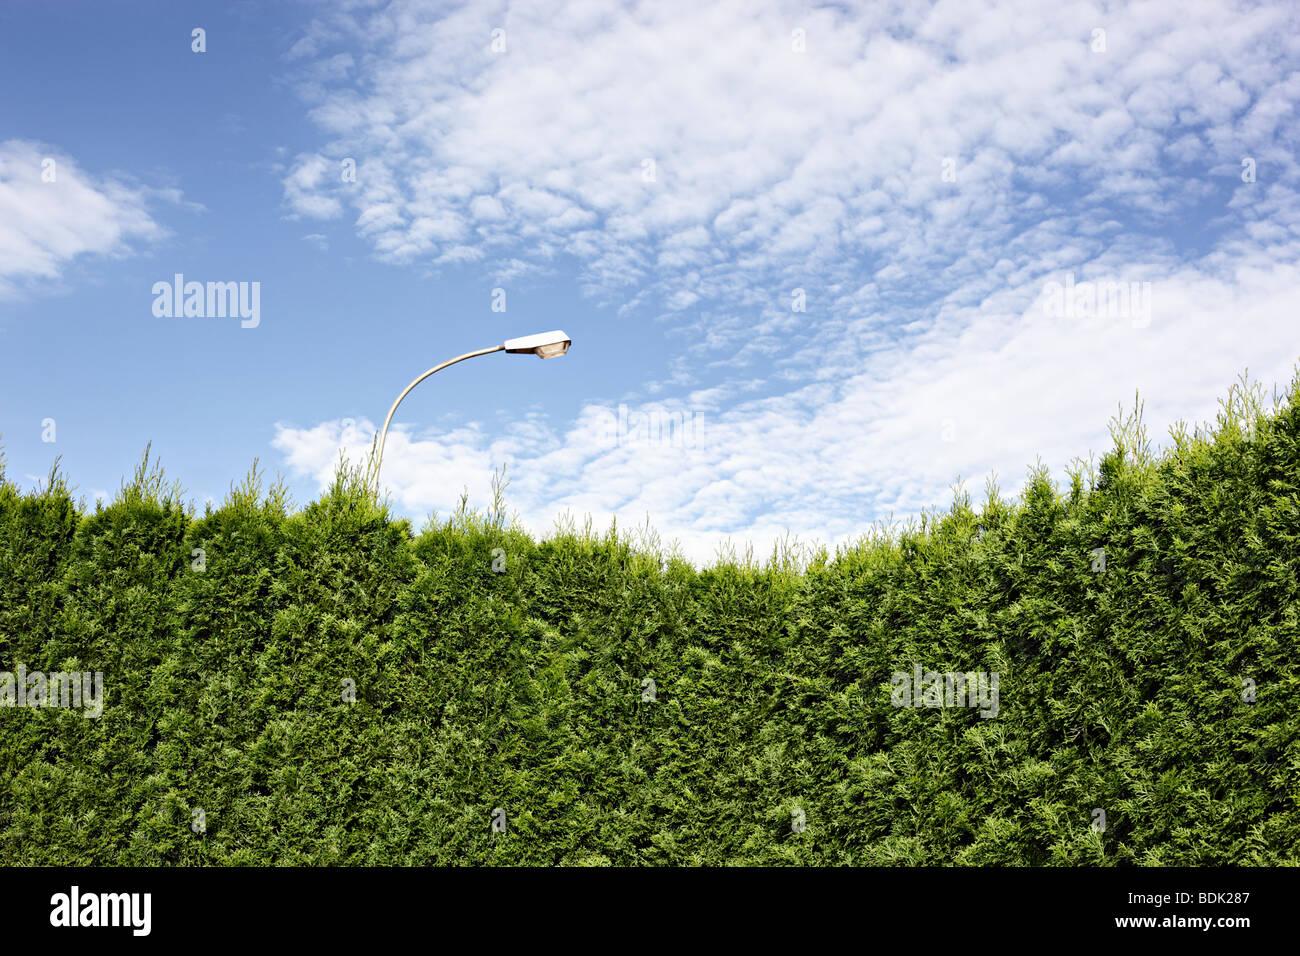 Gartenhecke